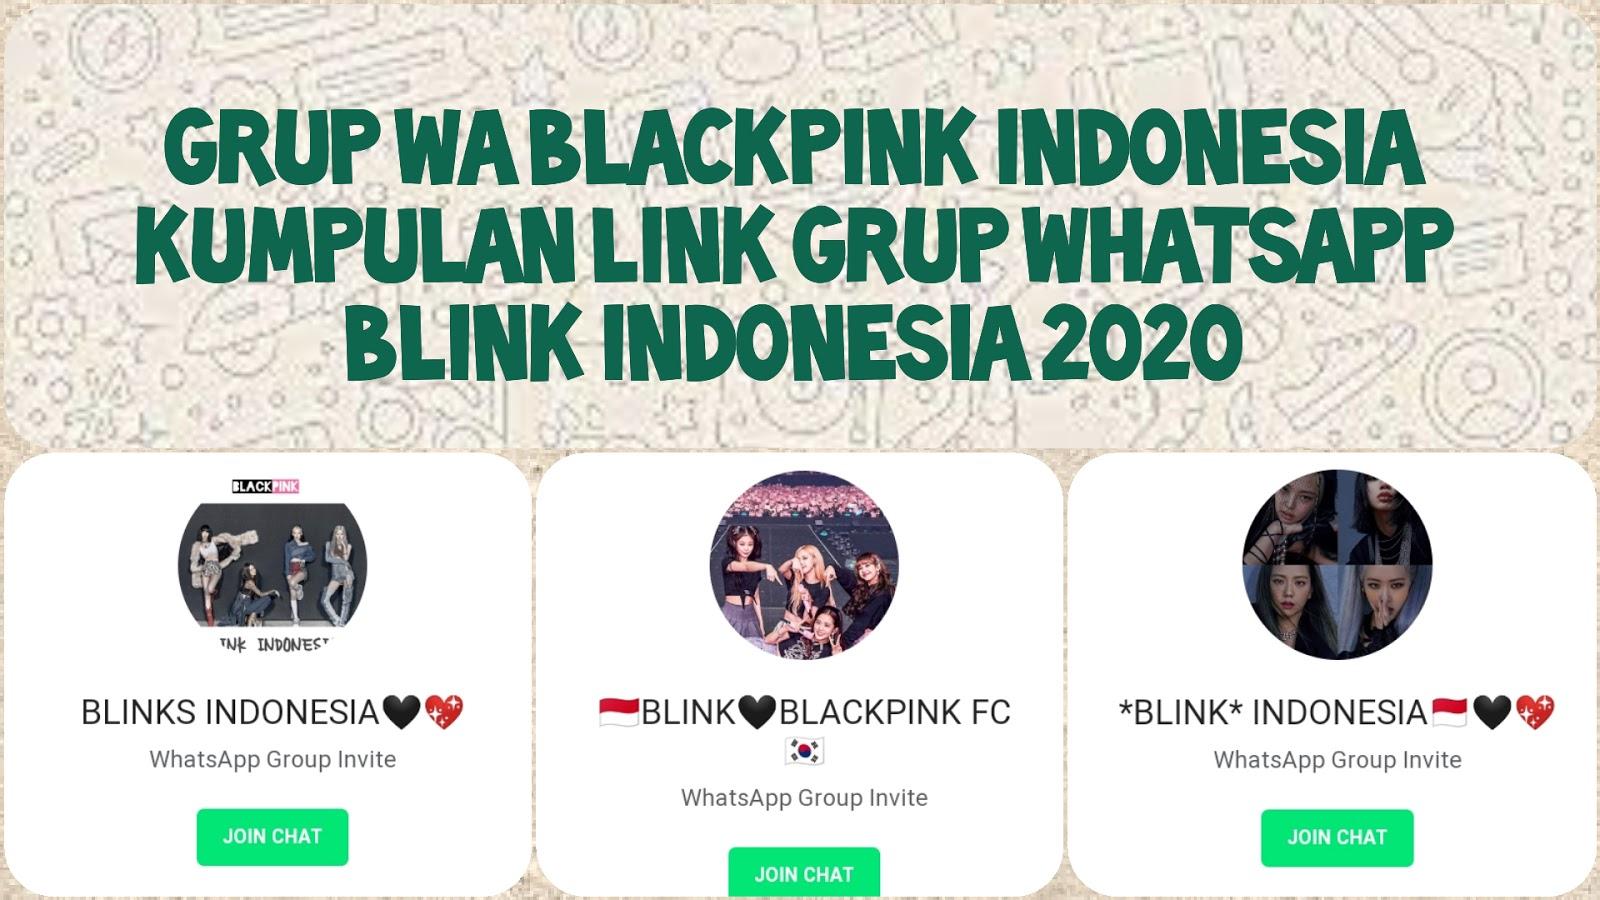 99 Link Grup Wa Blackpink 2021 Indonesia Internasional